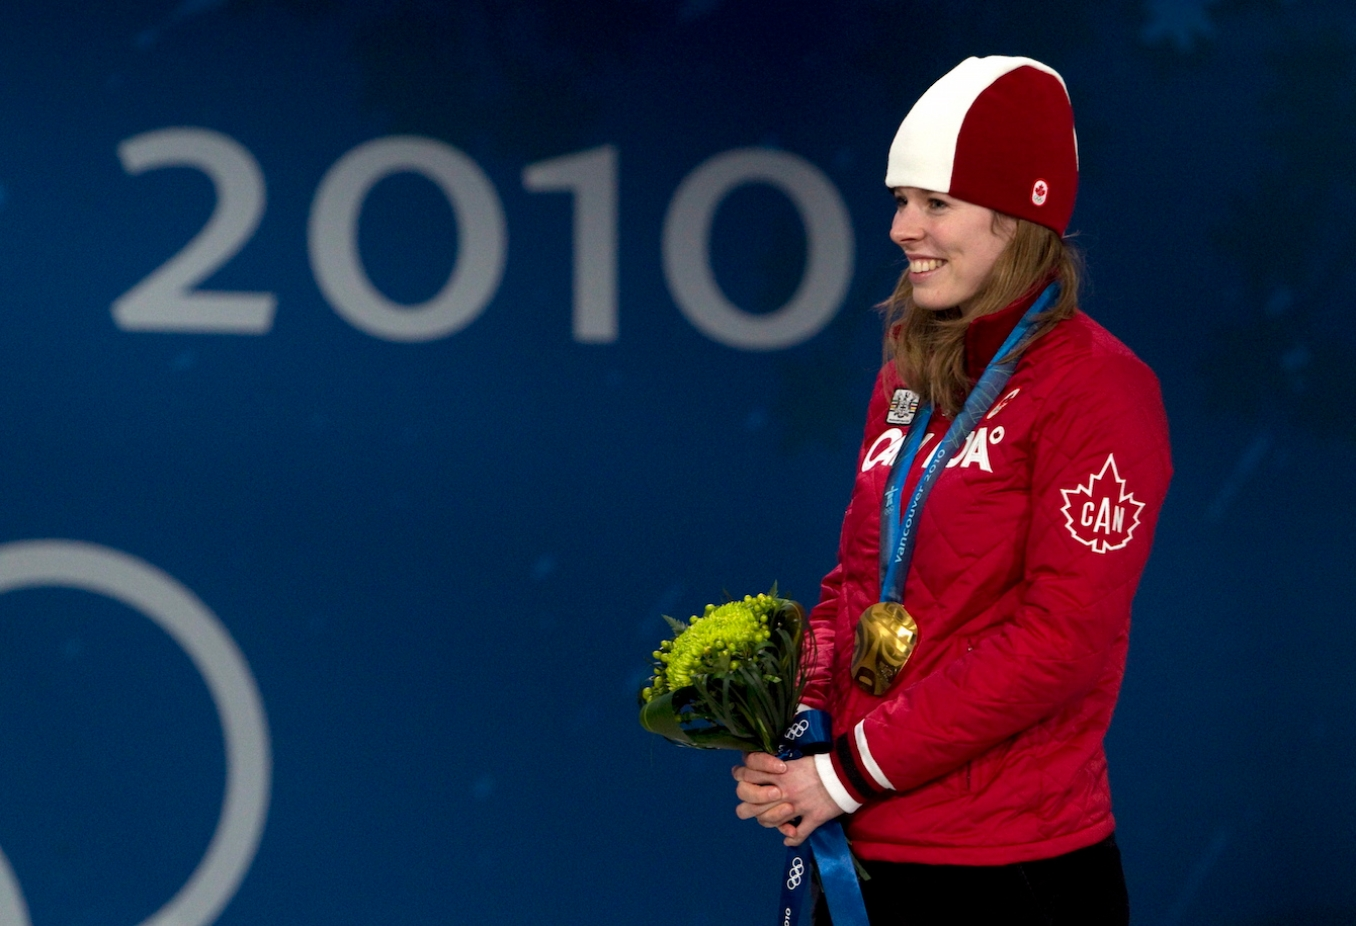 Christine Nesbitt (Vancouver 2010)